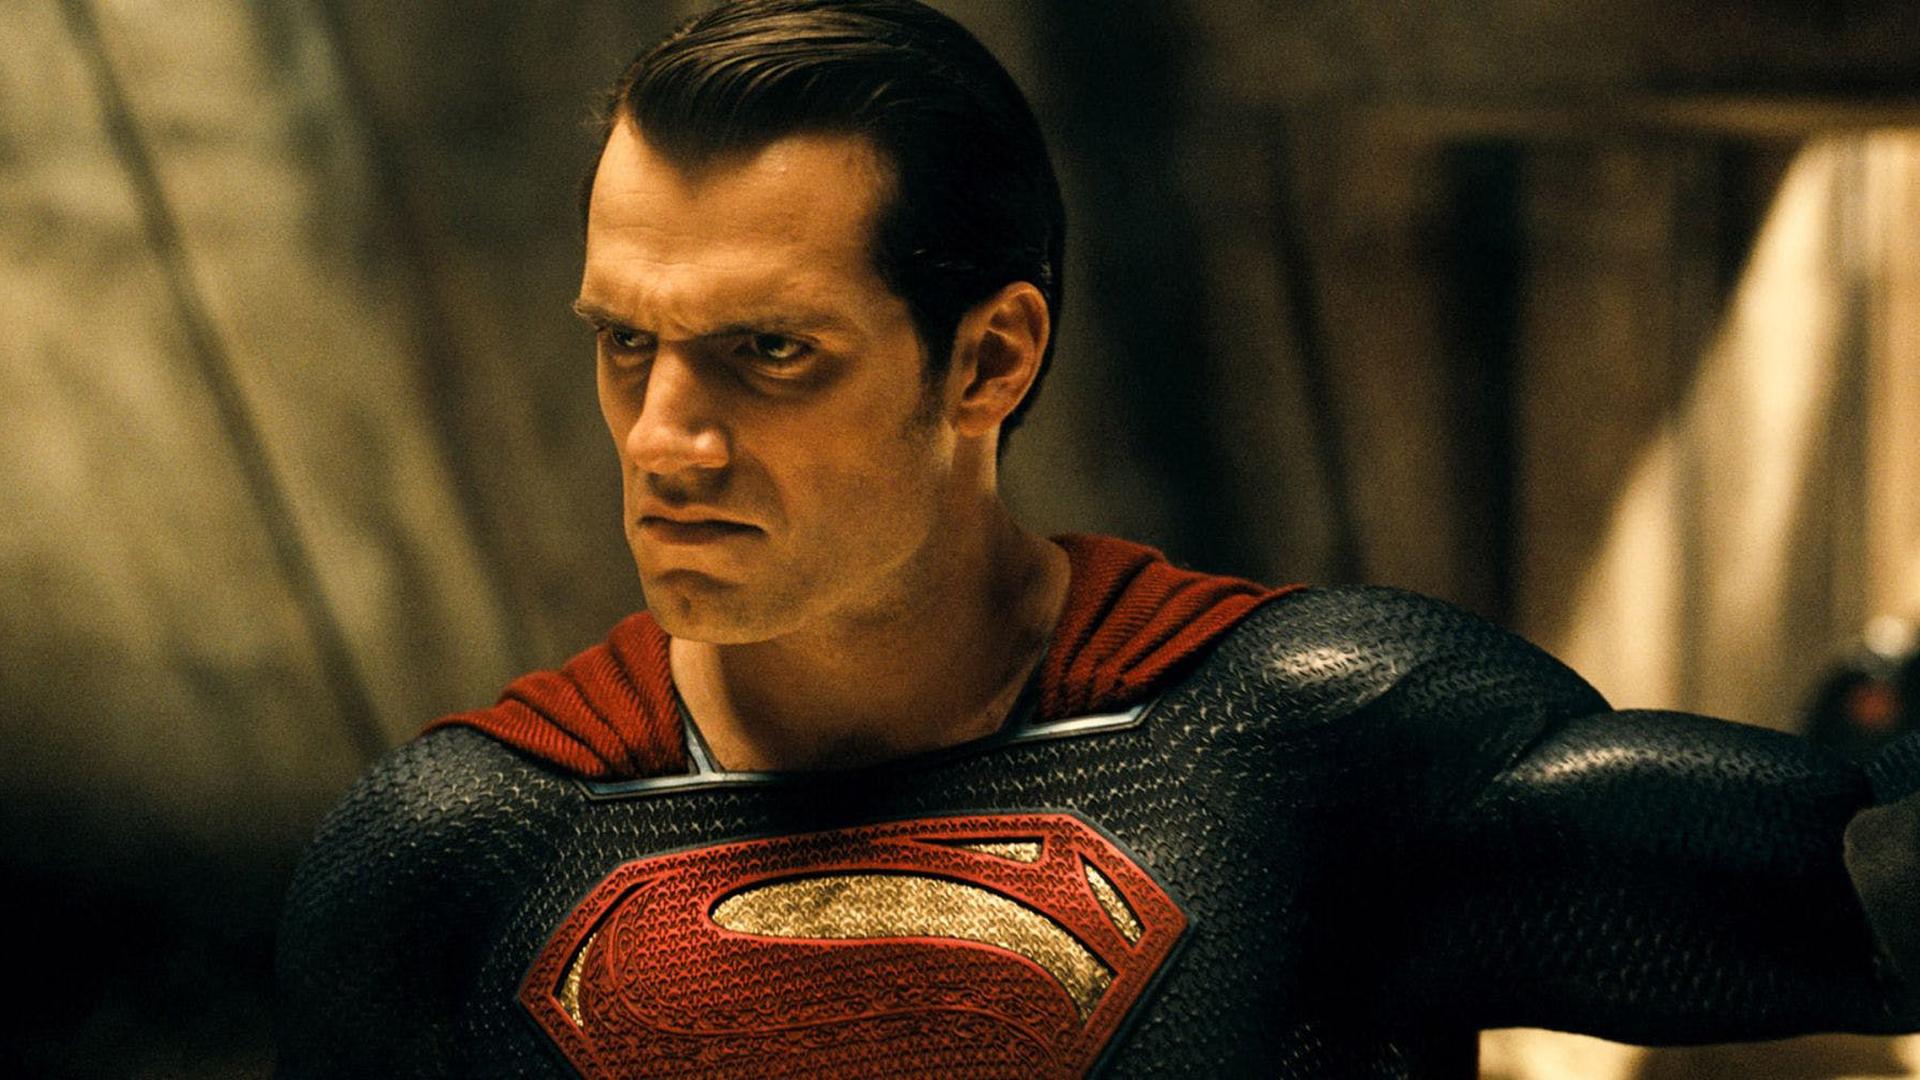 Injustice: Gods Among Us inspired the 'Evil Superman' dream in Batman V Superman